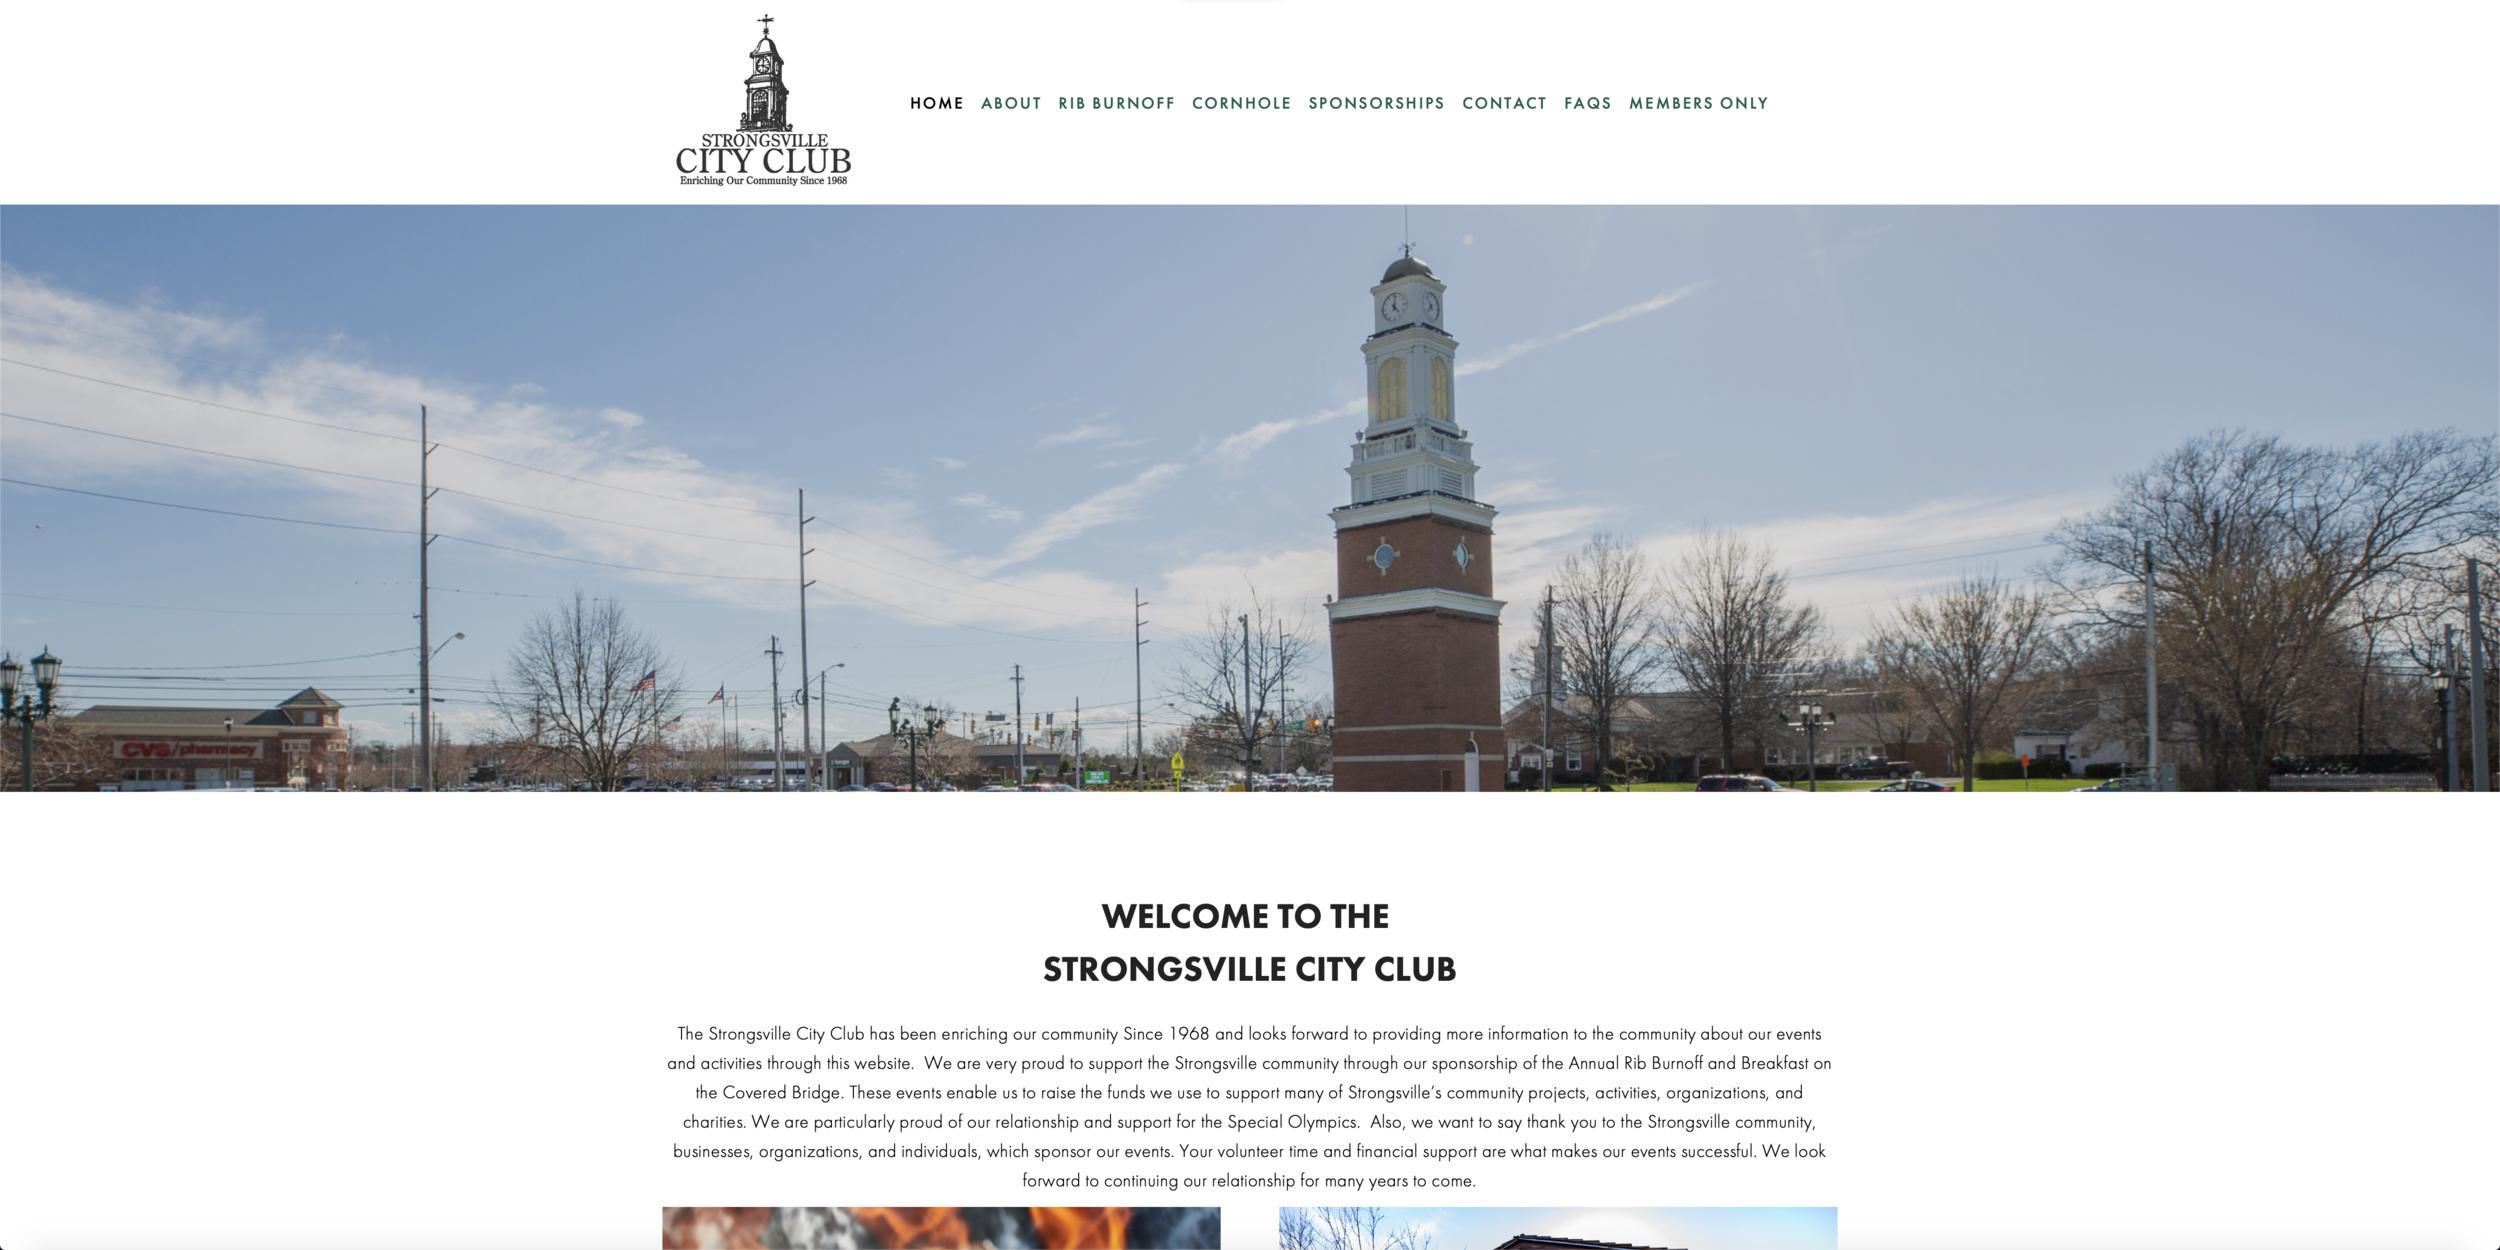 Strongsville City Club